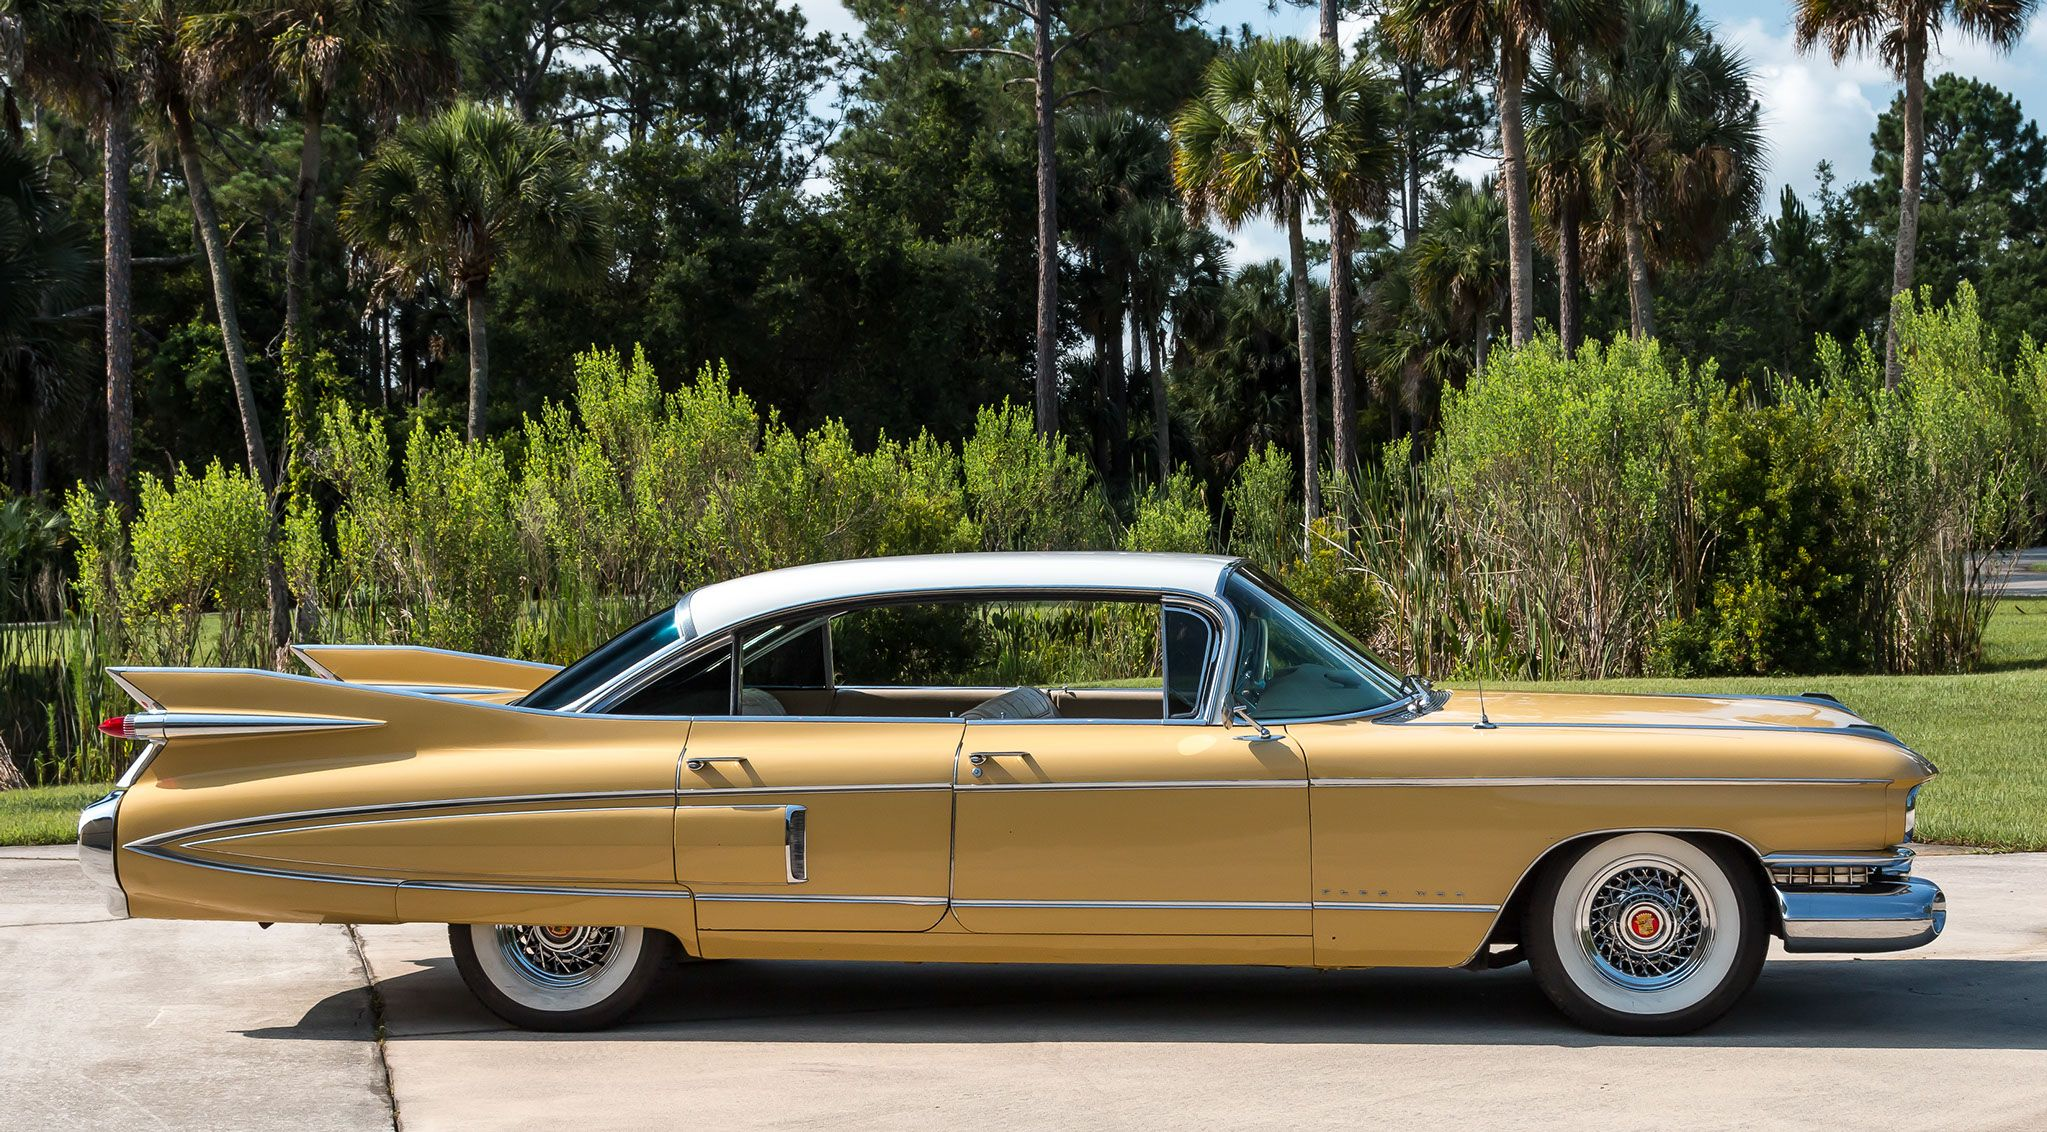 1959 Cadillac Fleetwood Sixty Special Sedan